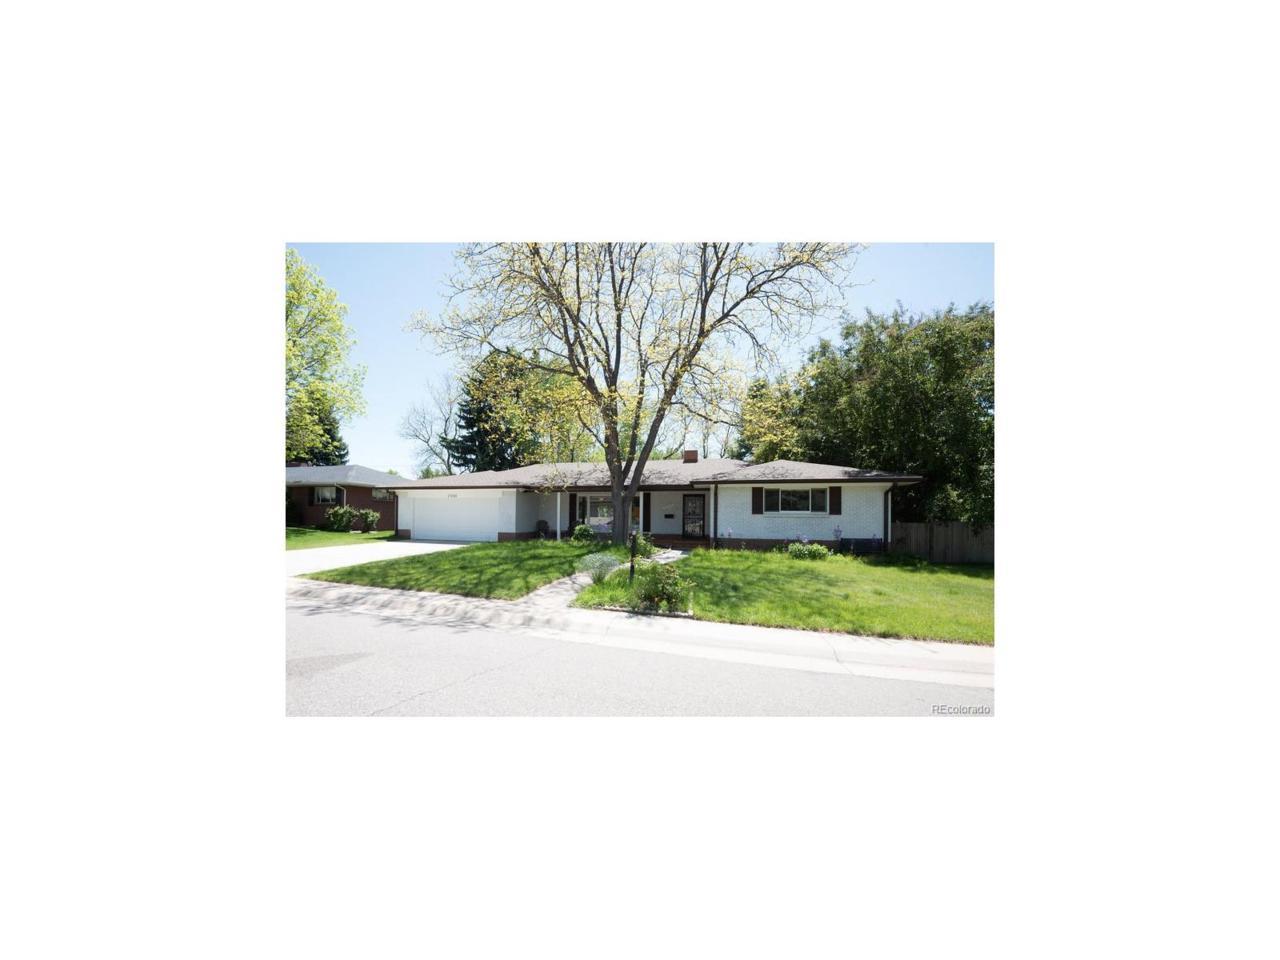 2500 E Flora Place, Denver, CO 80210 (MLS #2805876) :: 8z Real Estate